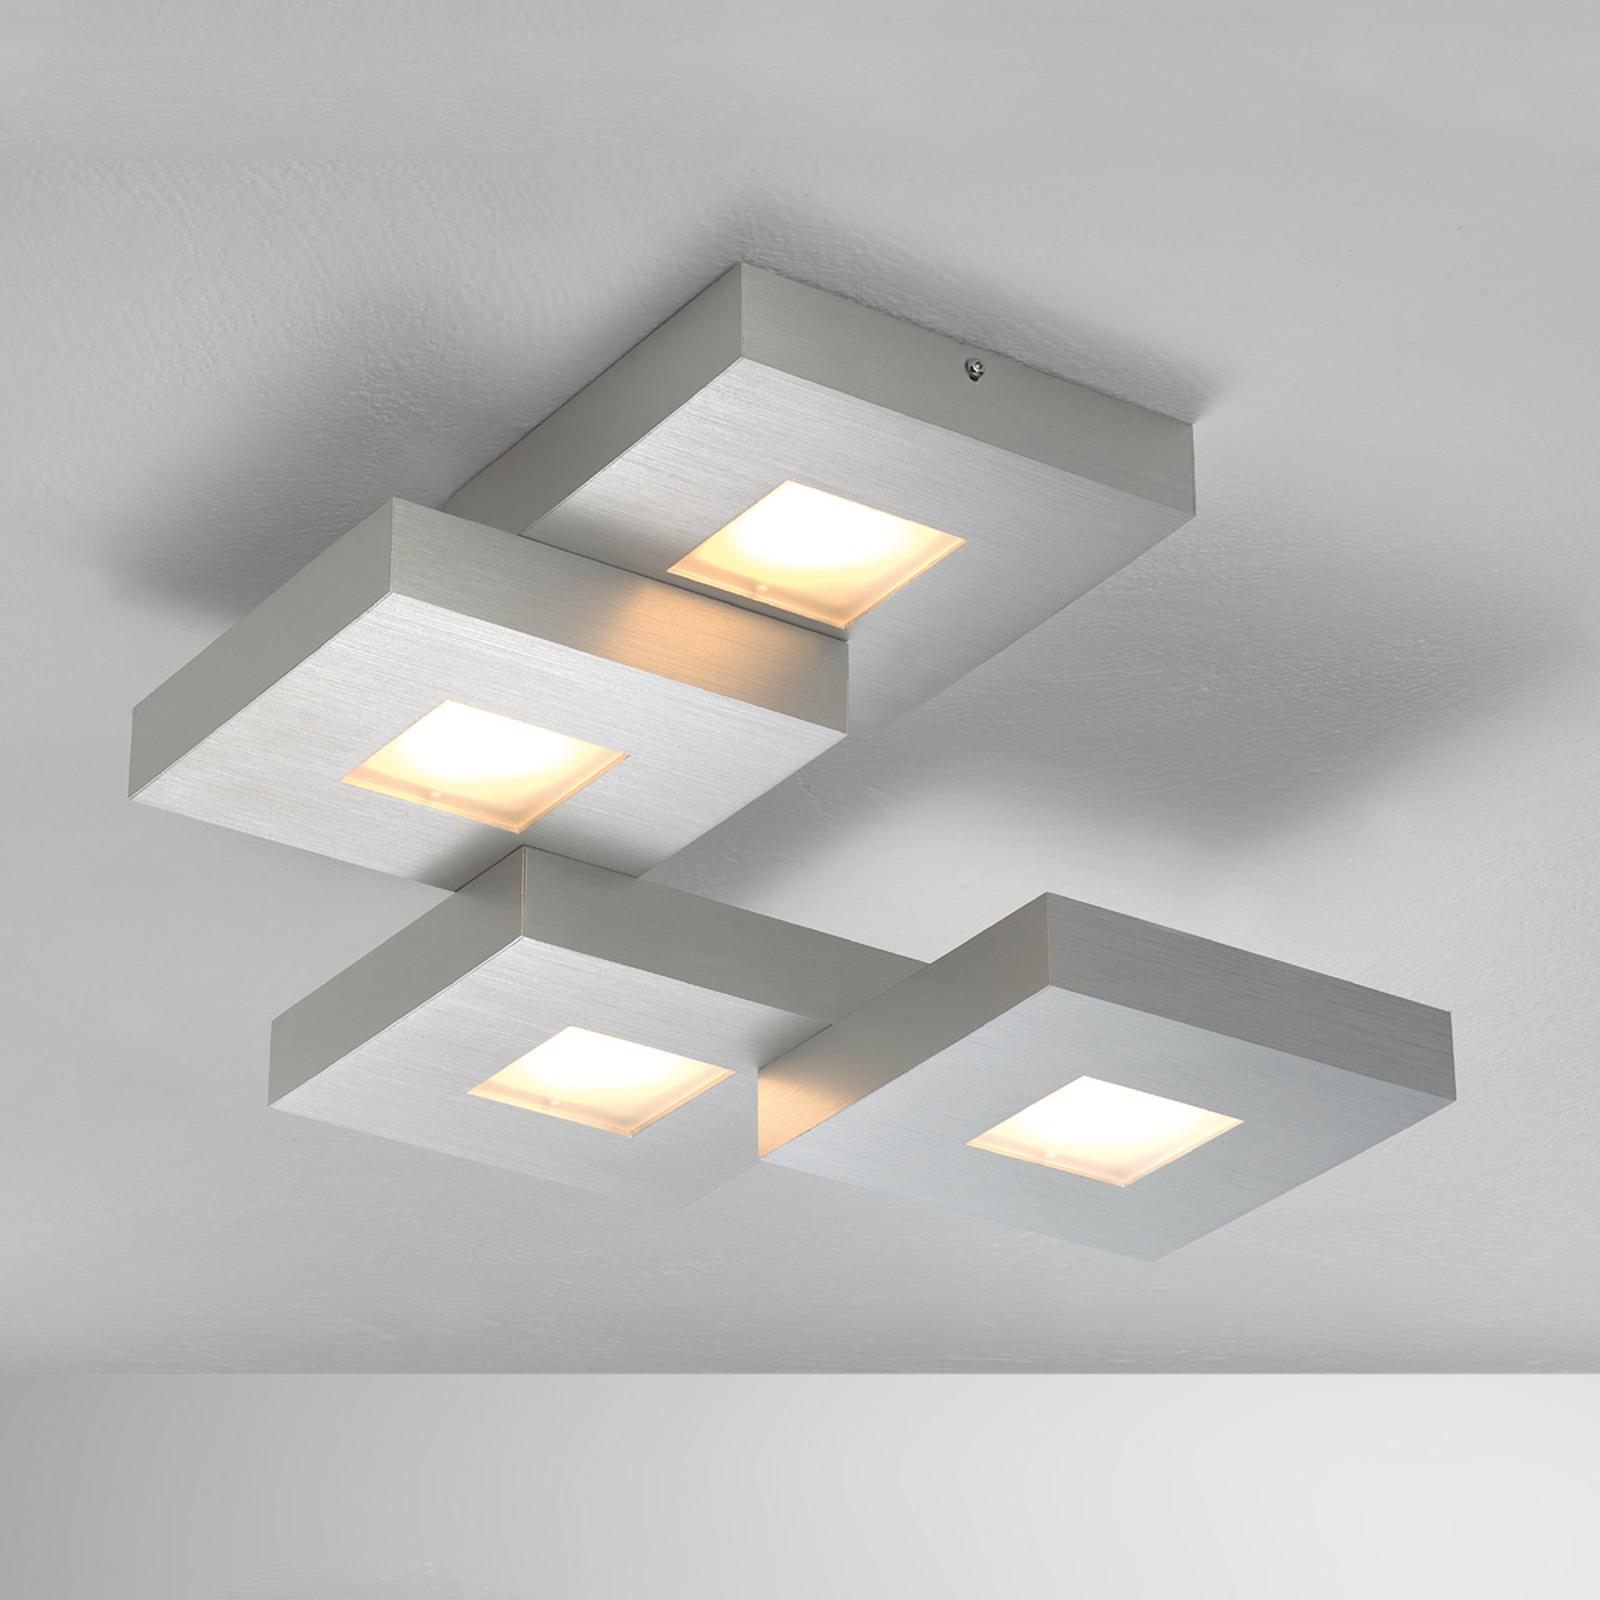 Trapvormig geplaatste LED-plafondlamp Cubus